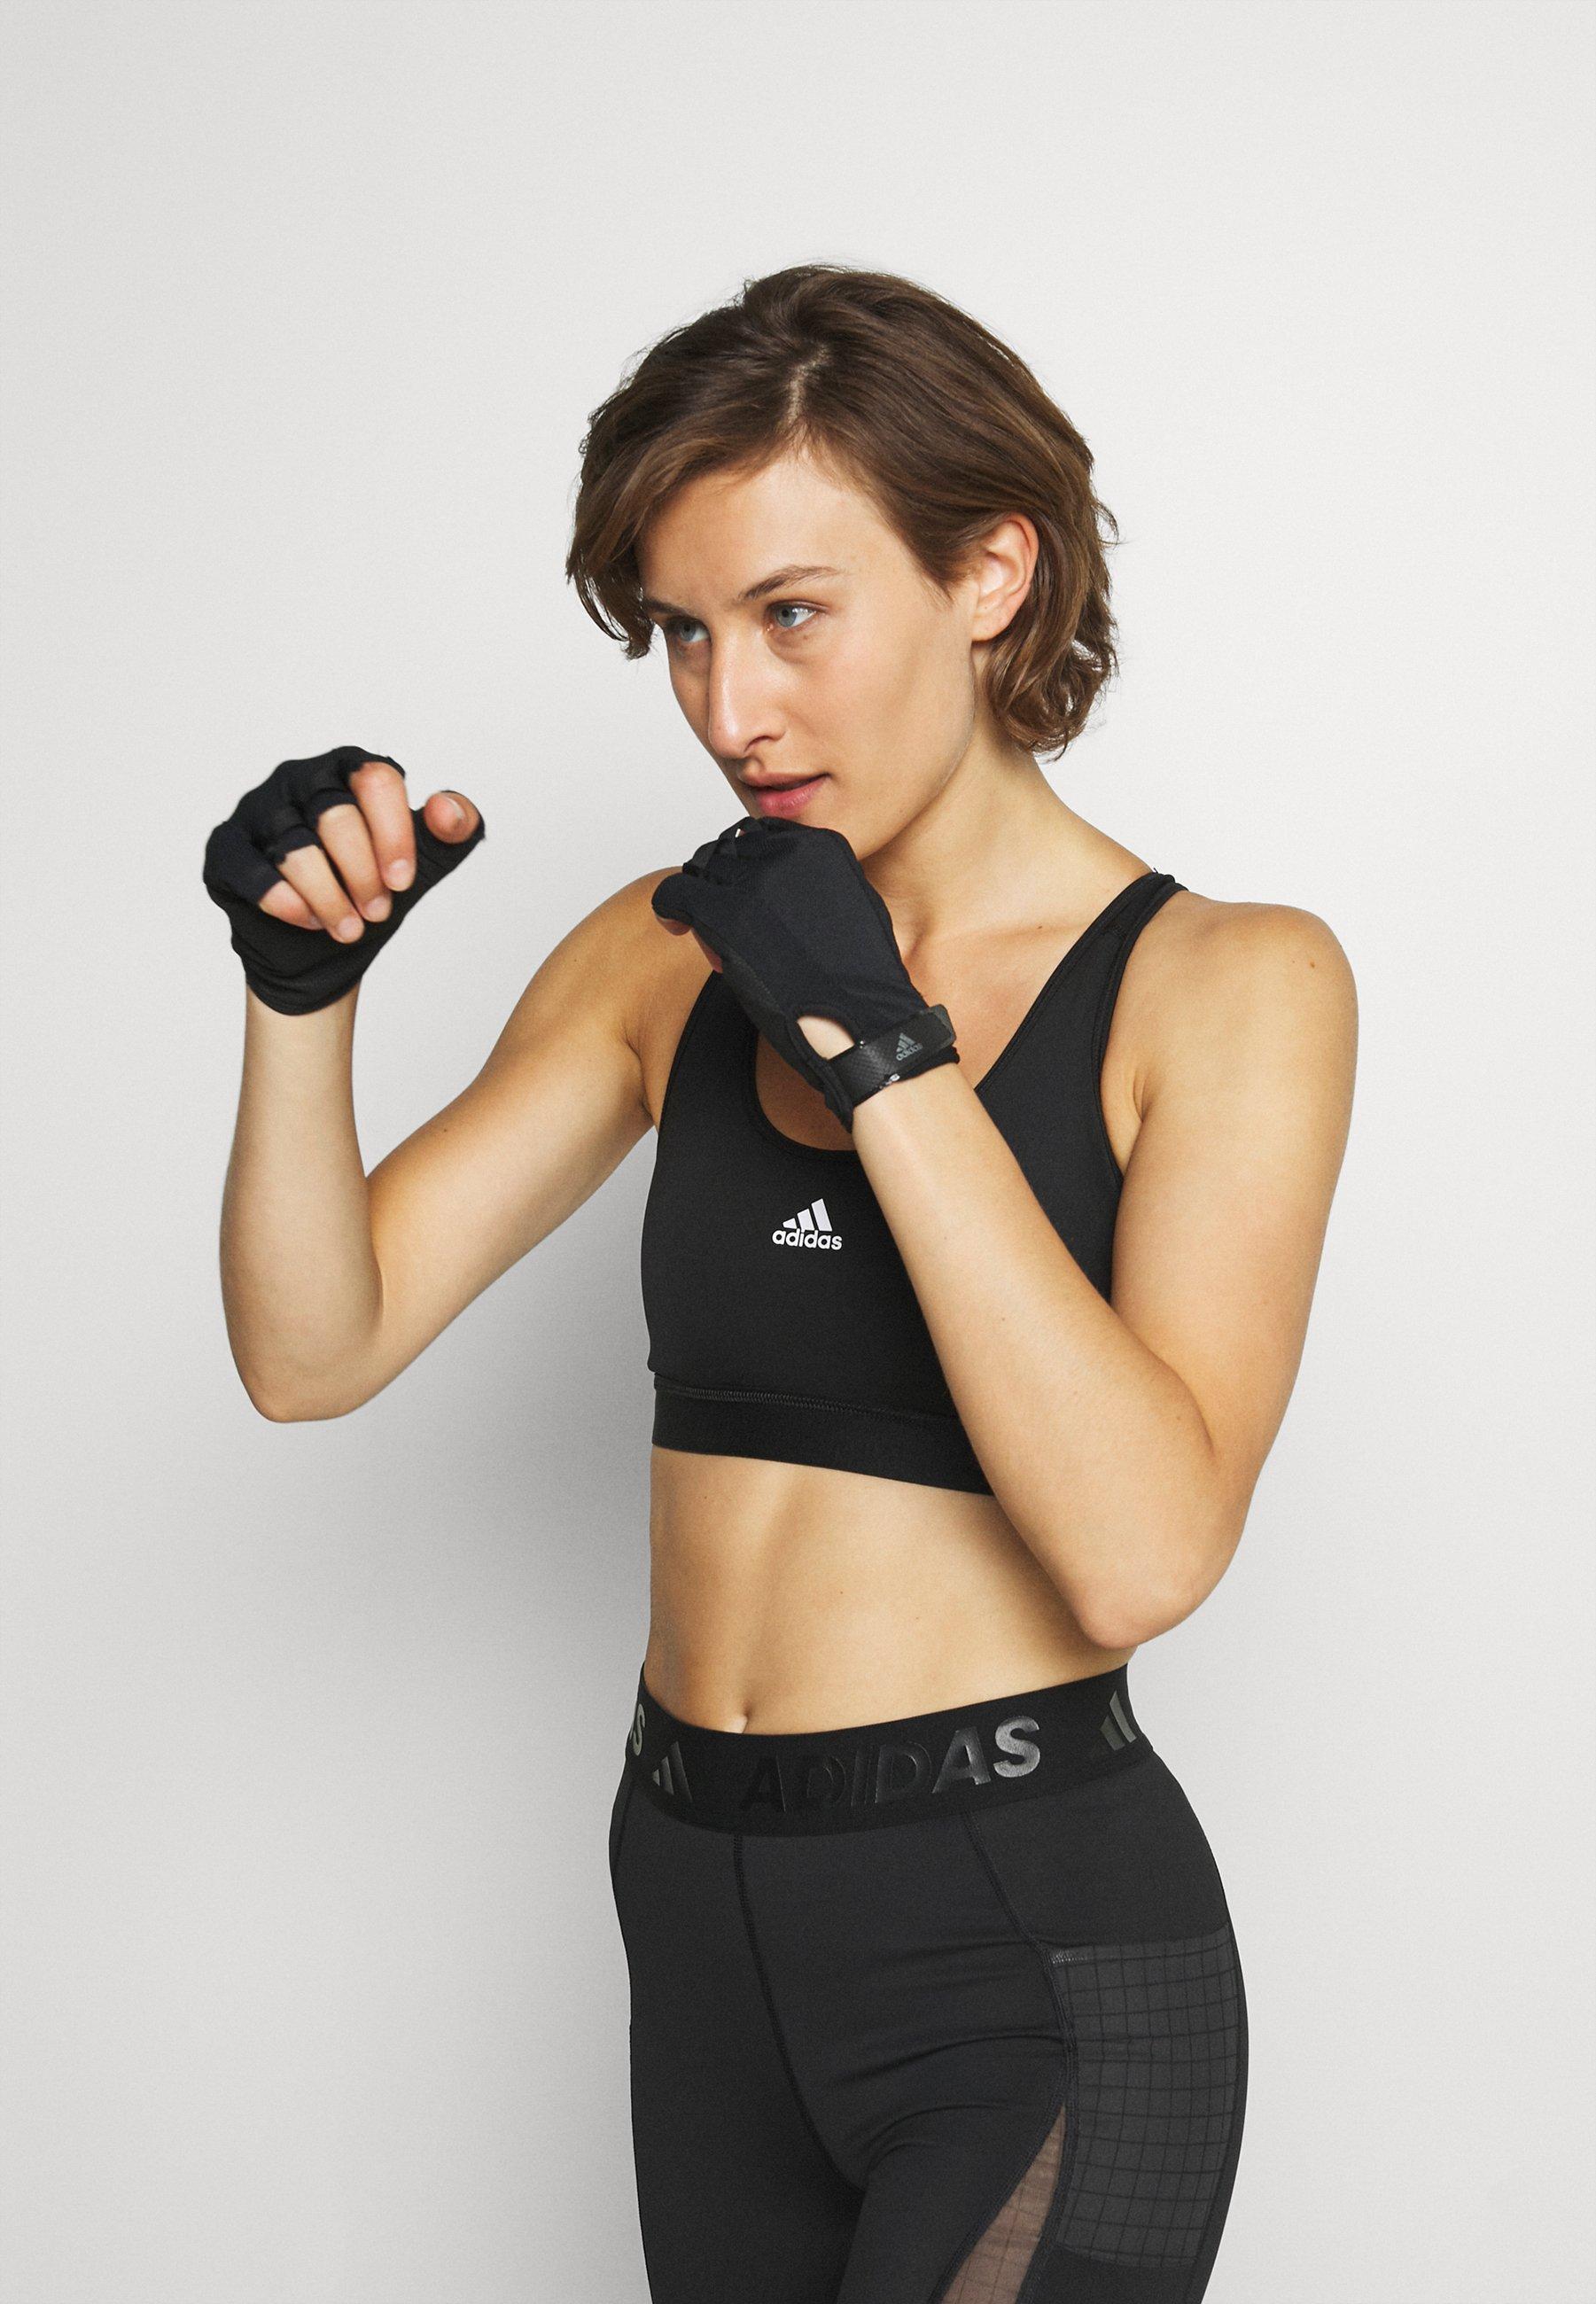 Women BRA - Medium support sports bra